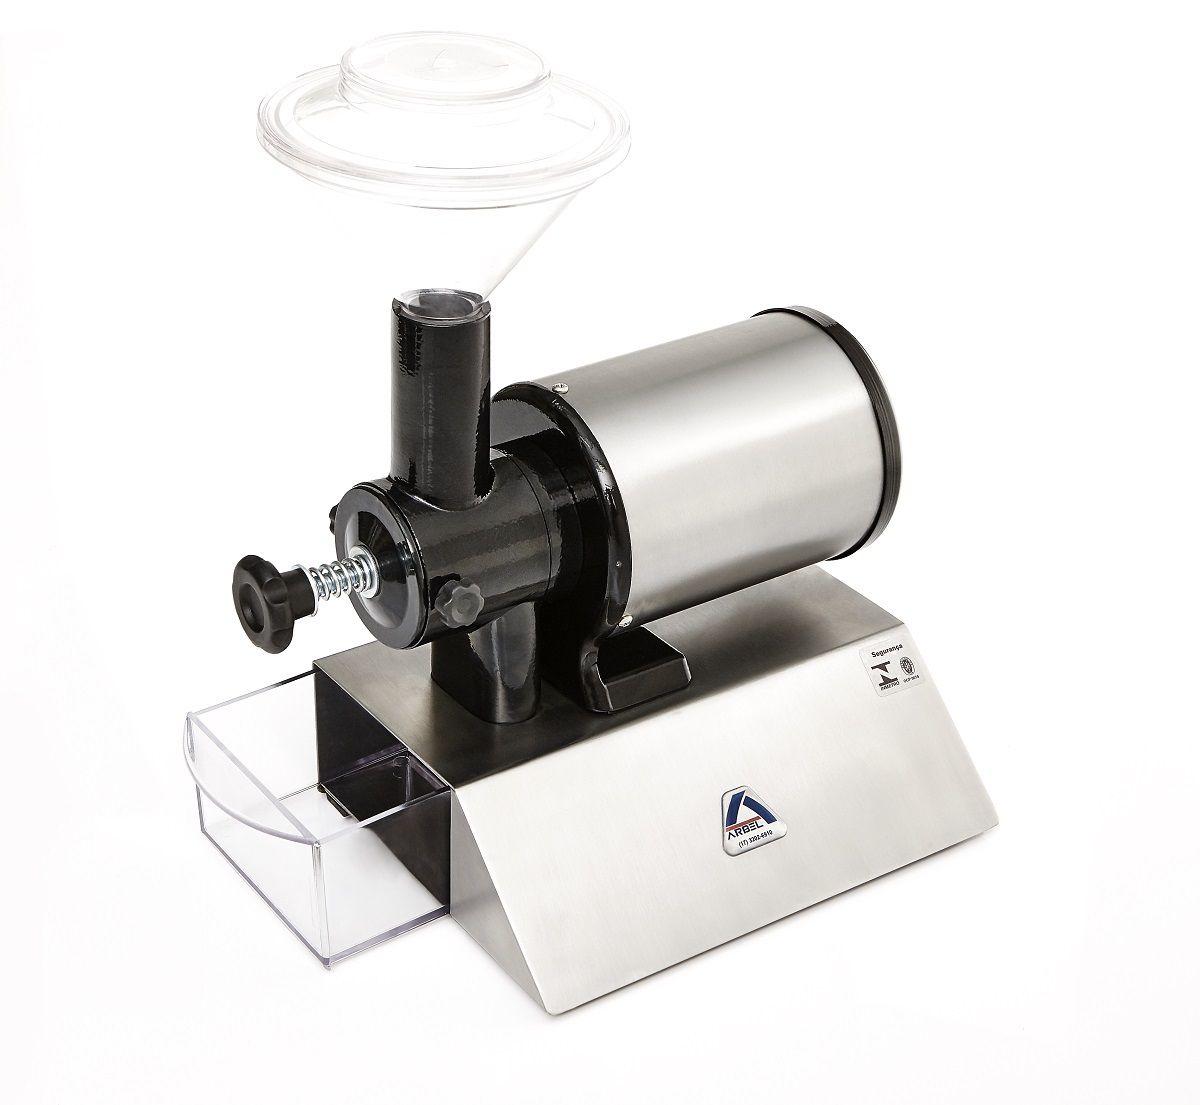 Moedor de Café Arbel Inox MCFX 55 - Monovolt